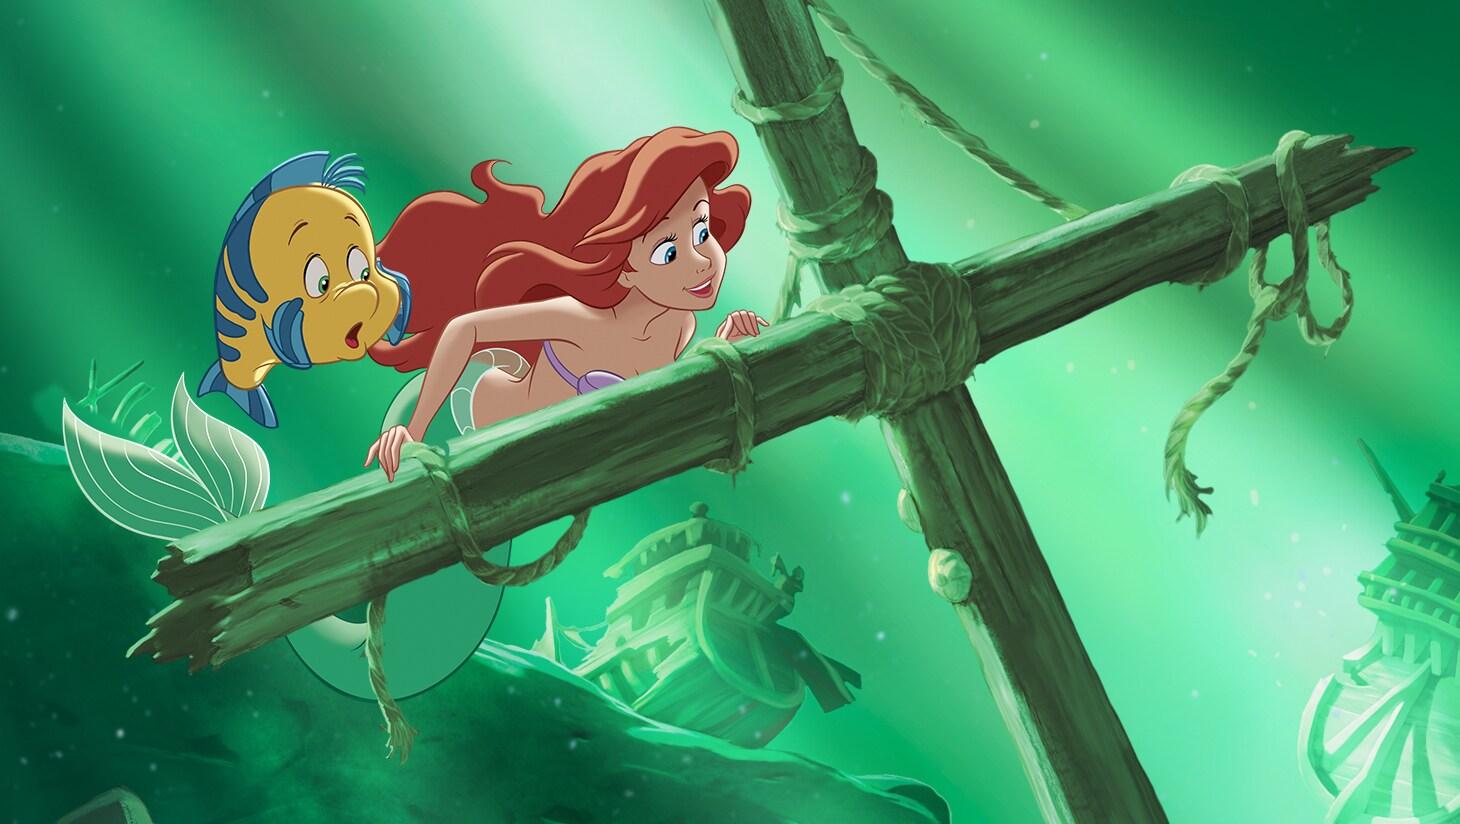 Ariel and Flounder explore a shipwreck